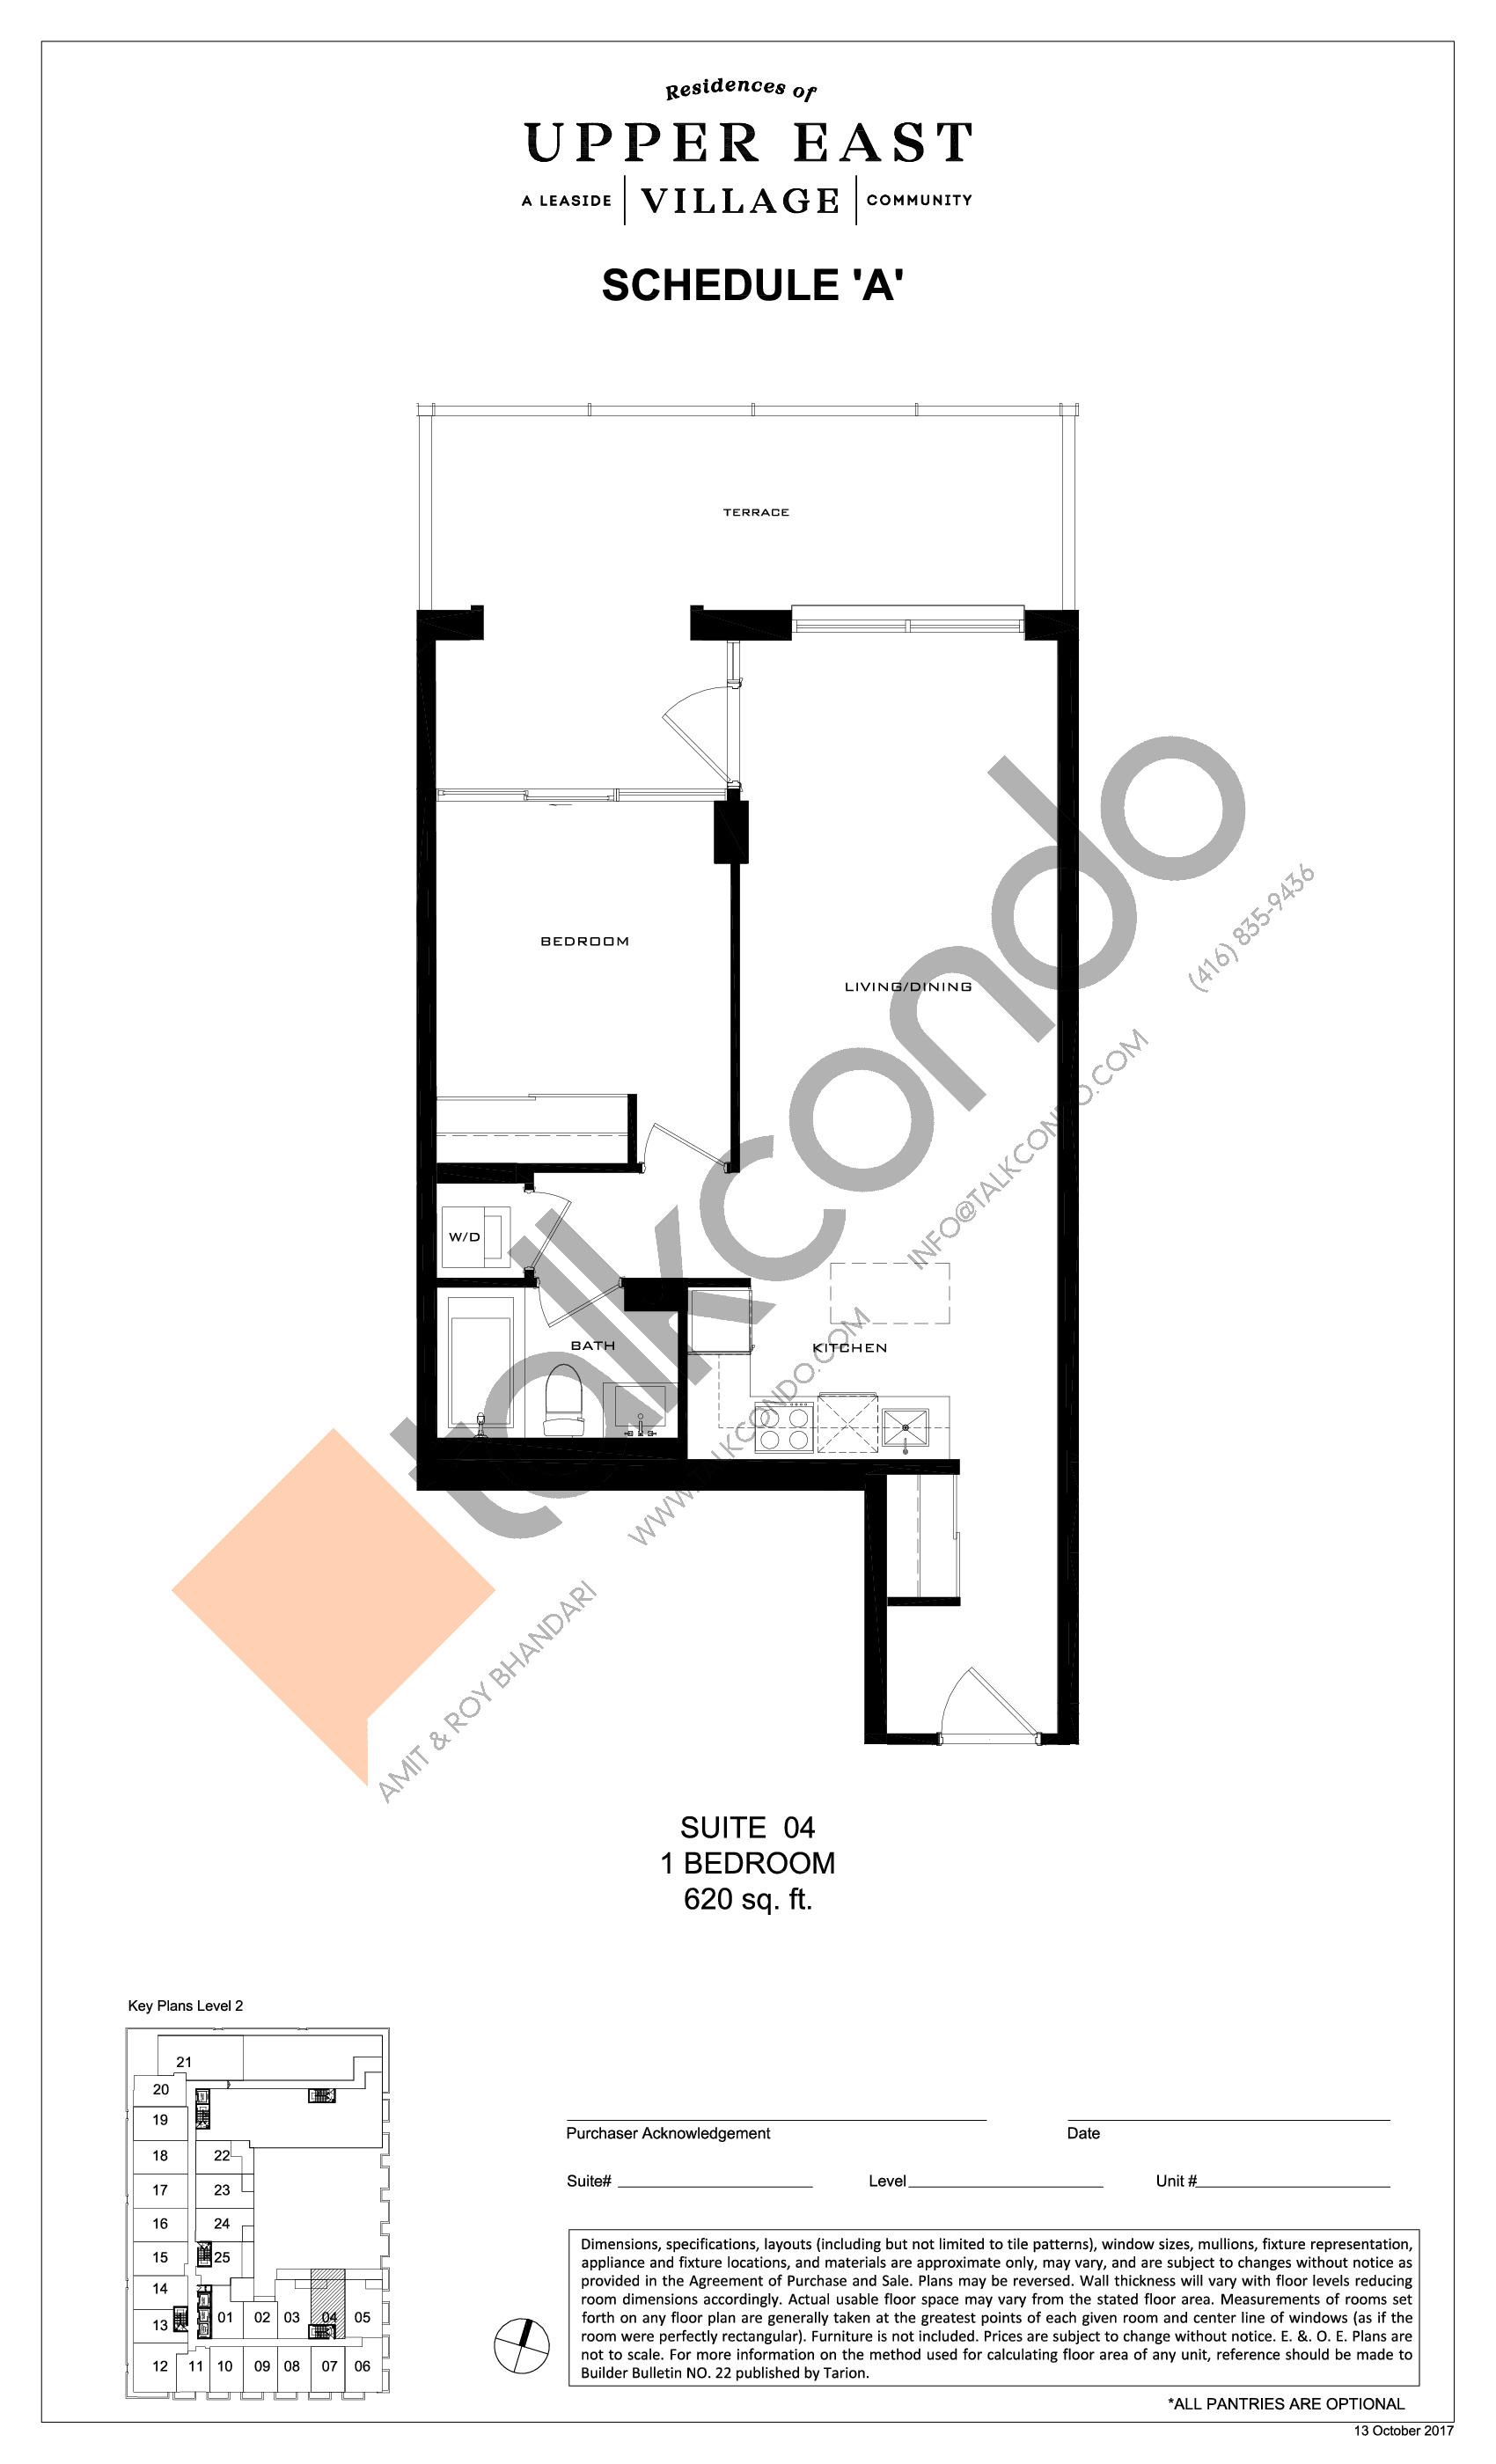 Suite 04 Floor Plan at Upper East Village Condos - 620 sq.ft